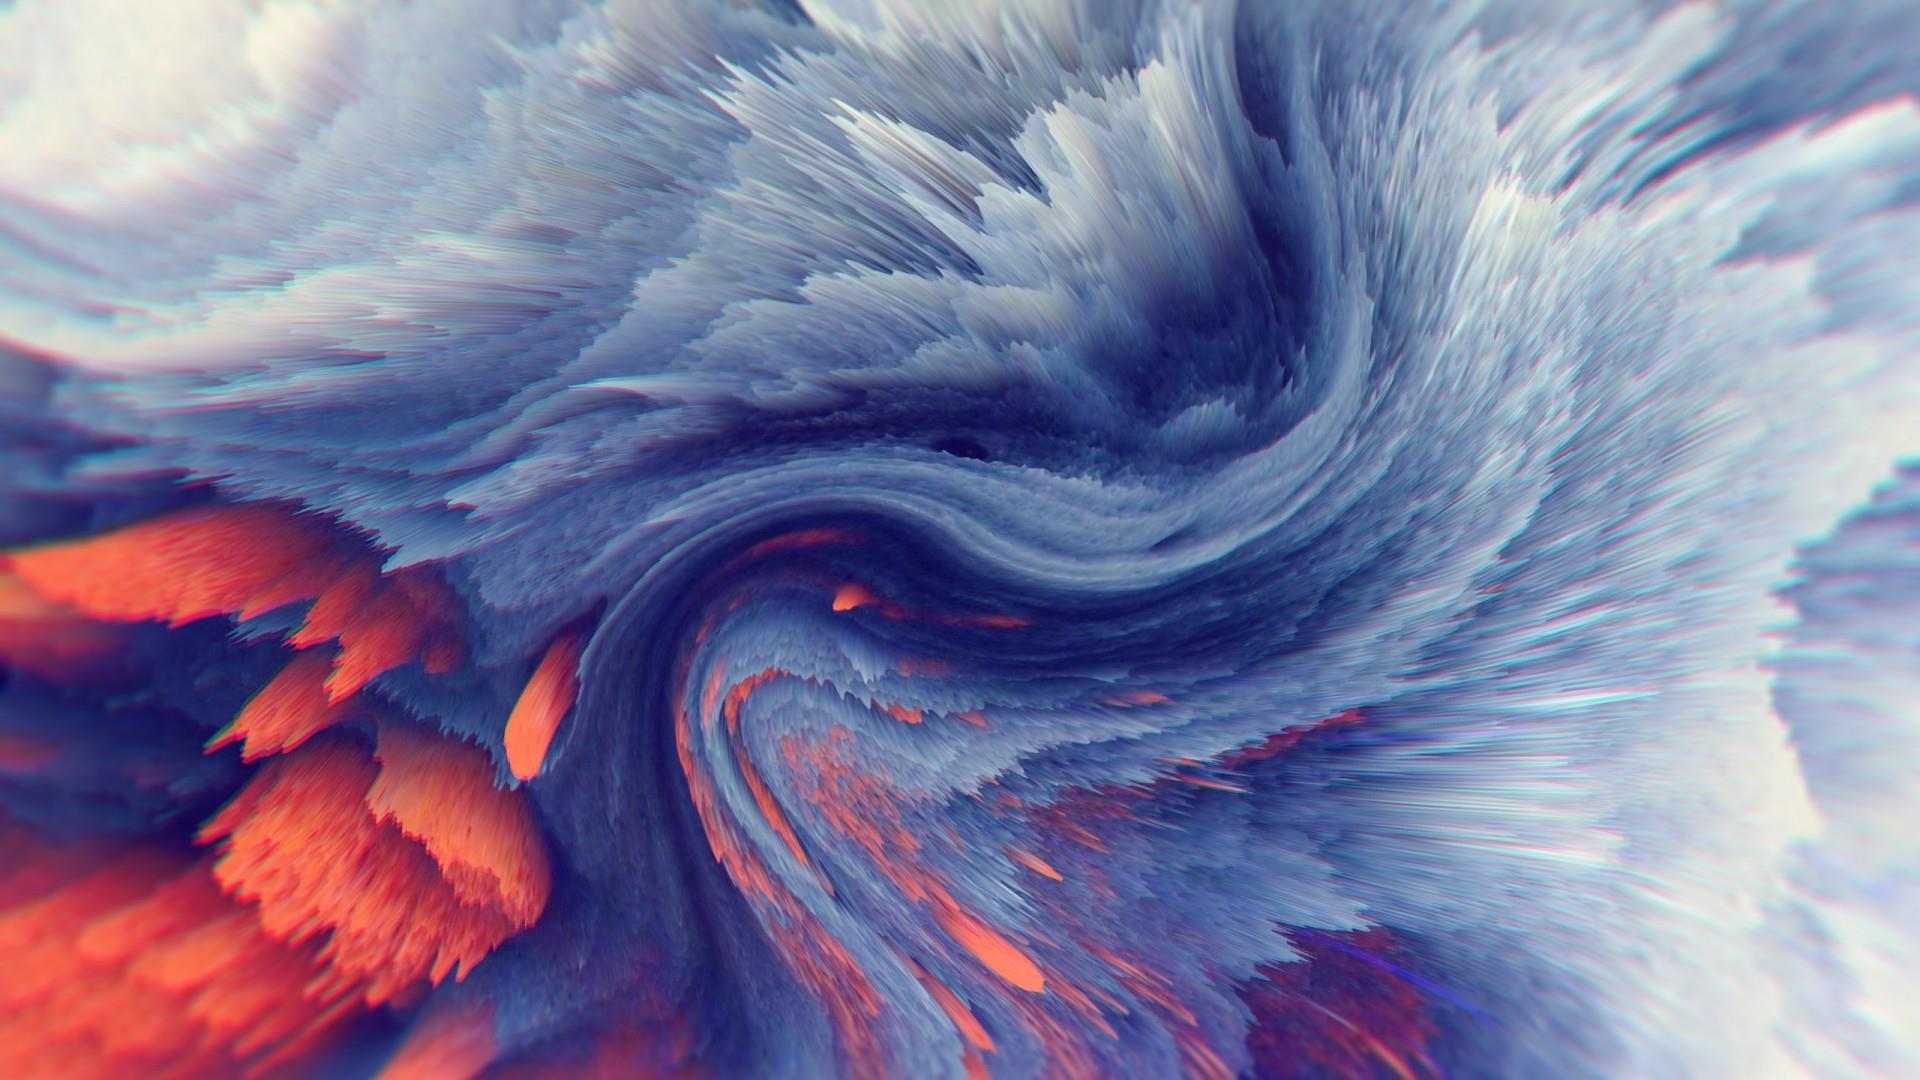 fantastic hd waves image